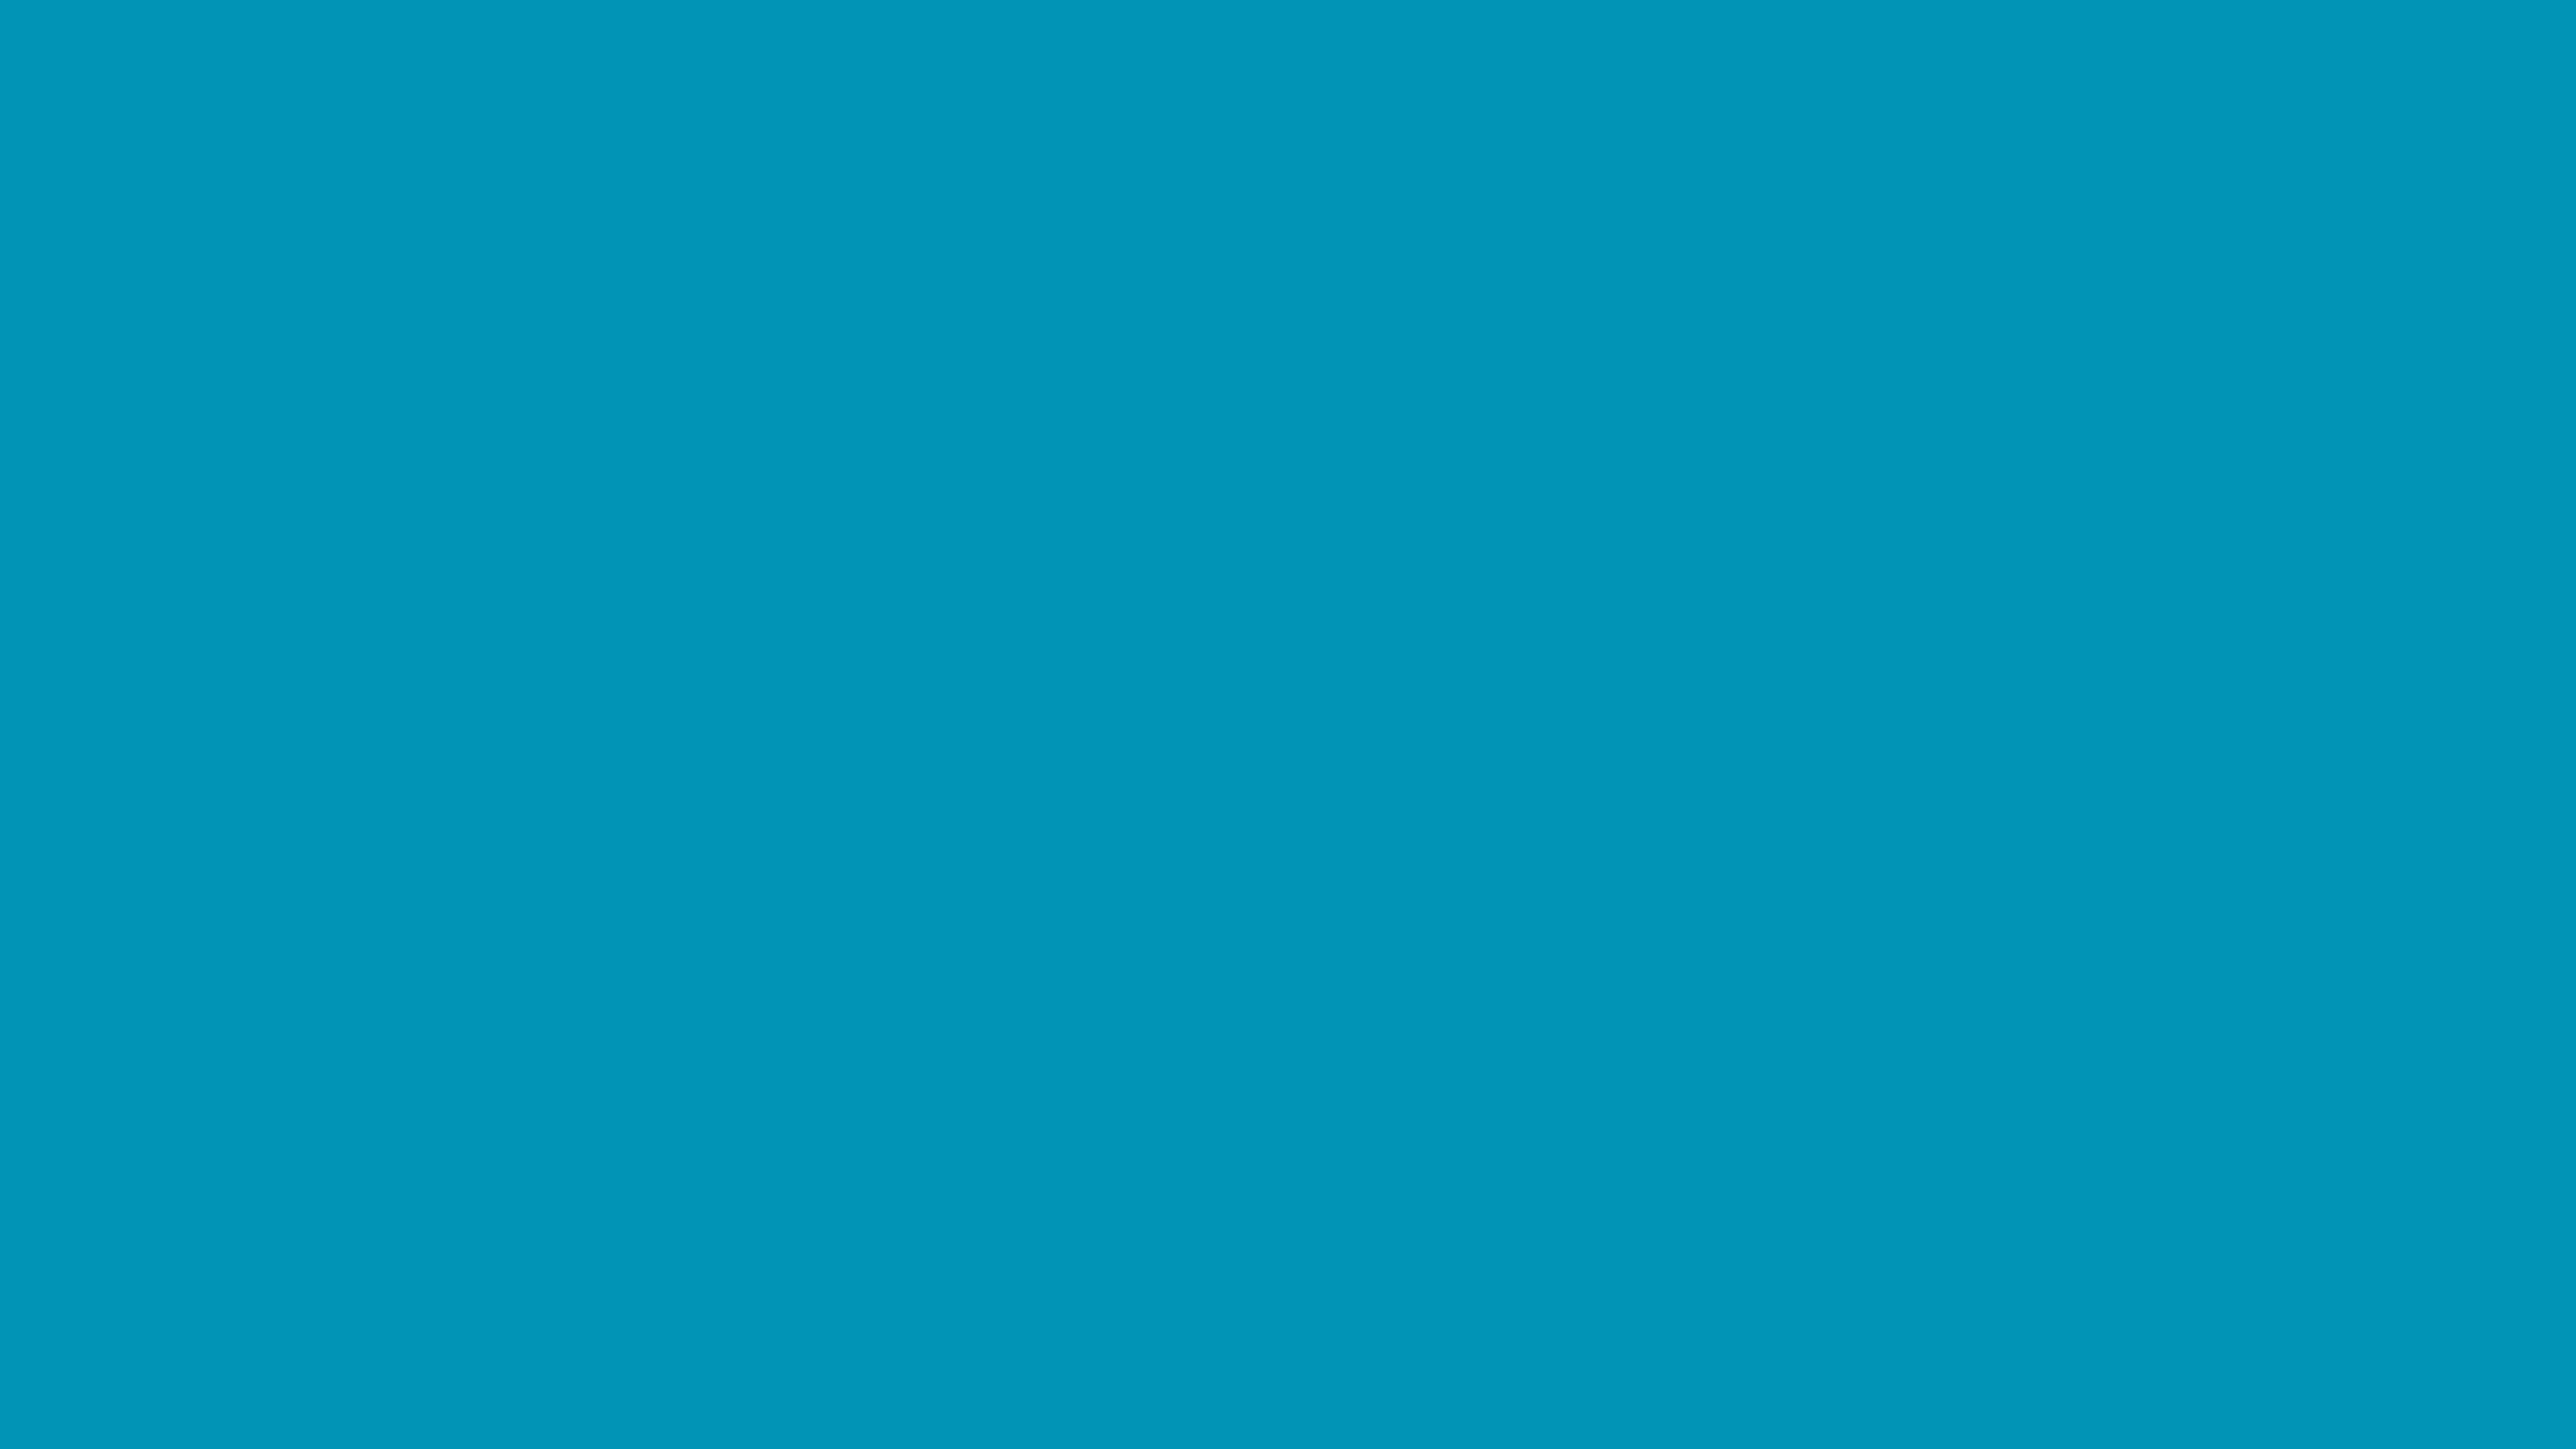 3840x2160 Bondi Blue Solid Color Background